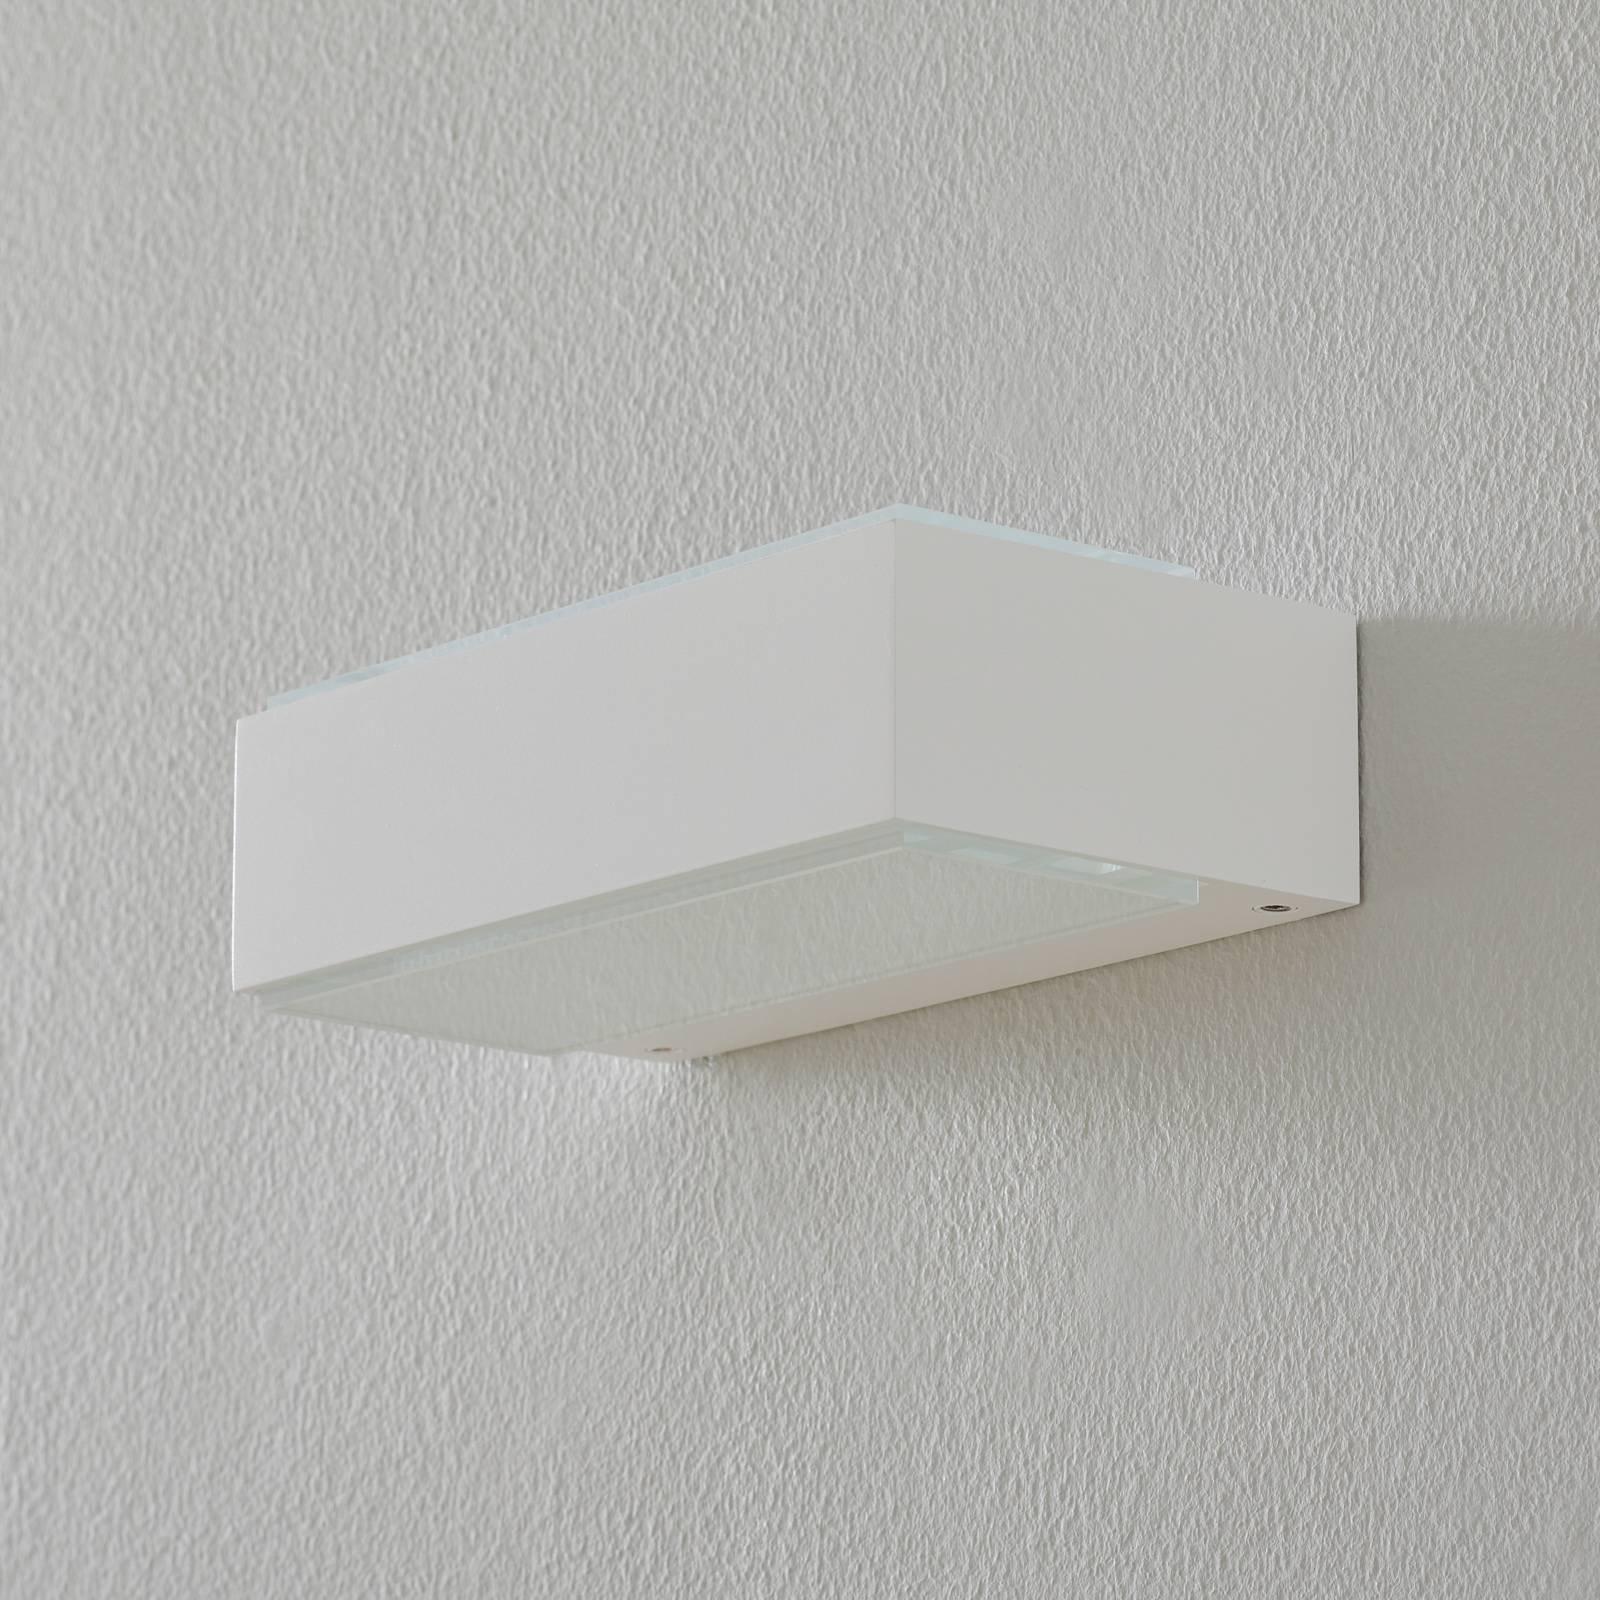 BEGA 12277 LED-vegglampe 3 000 K 20 cm hvit